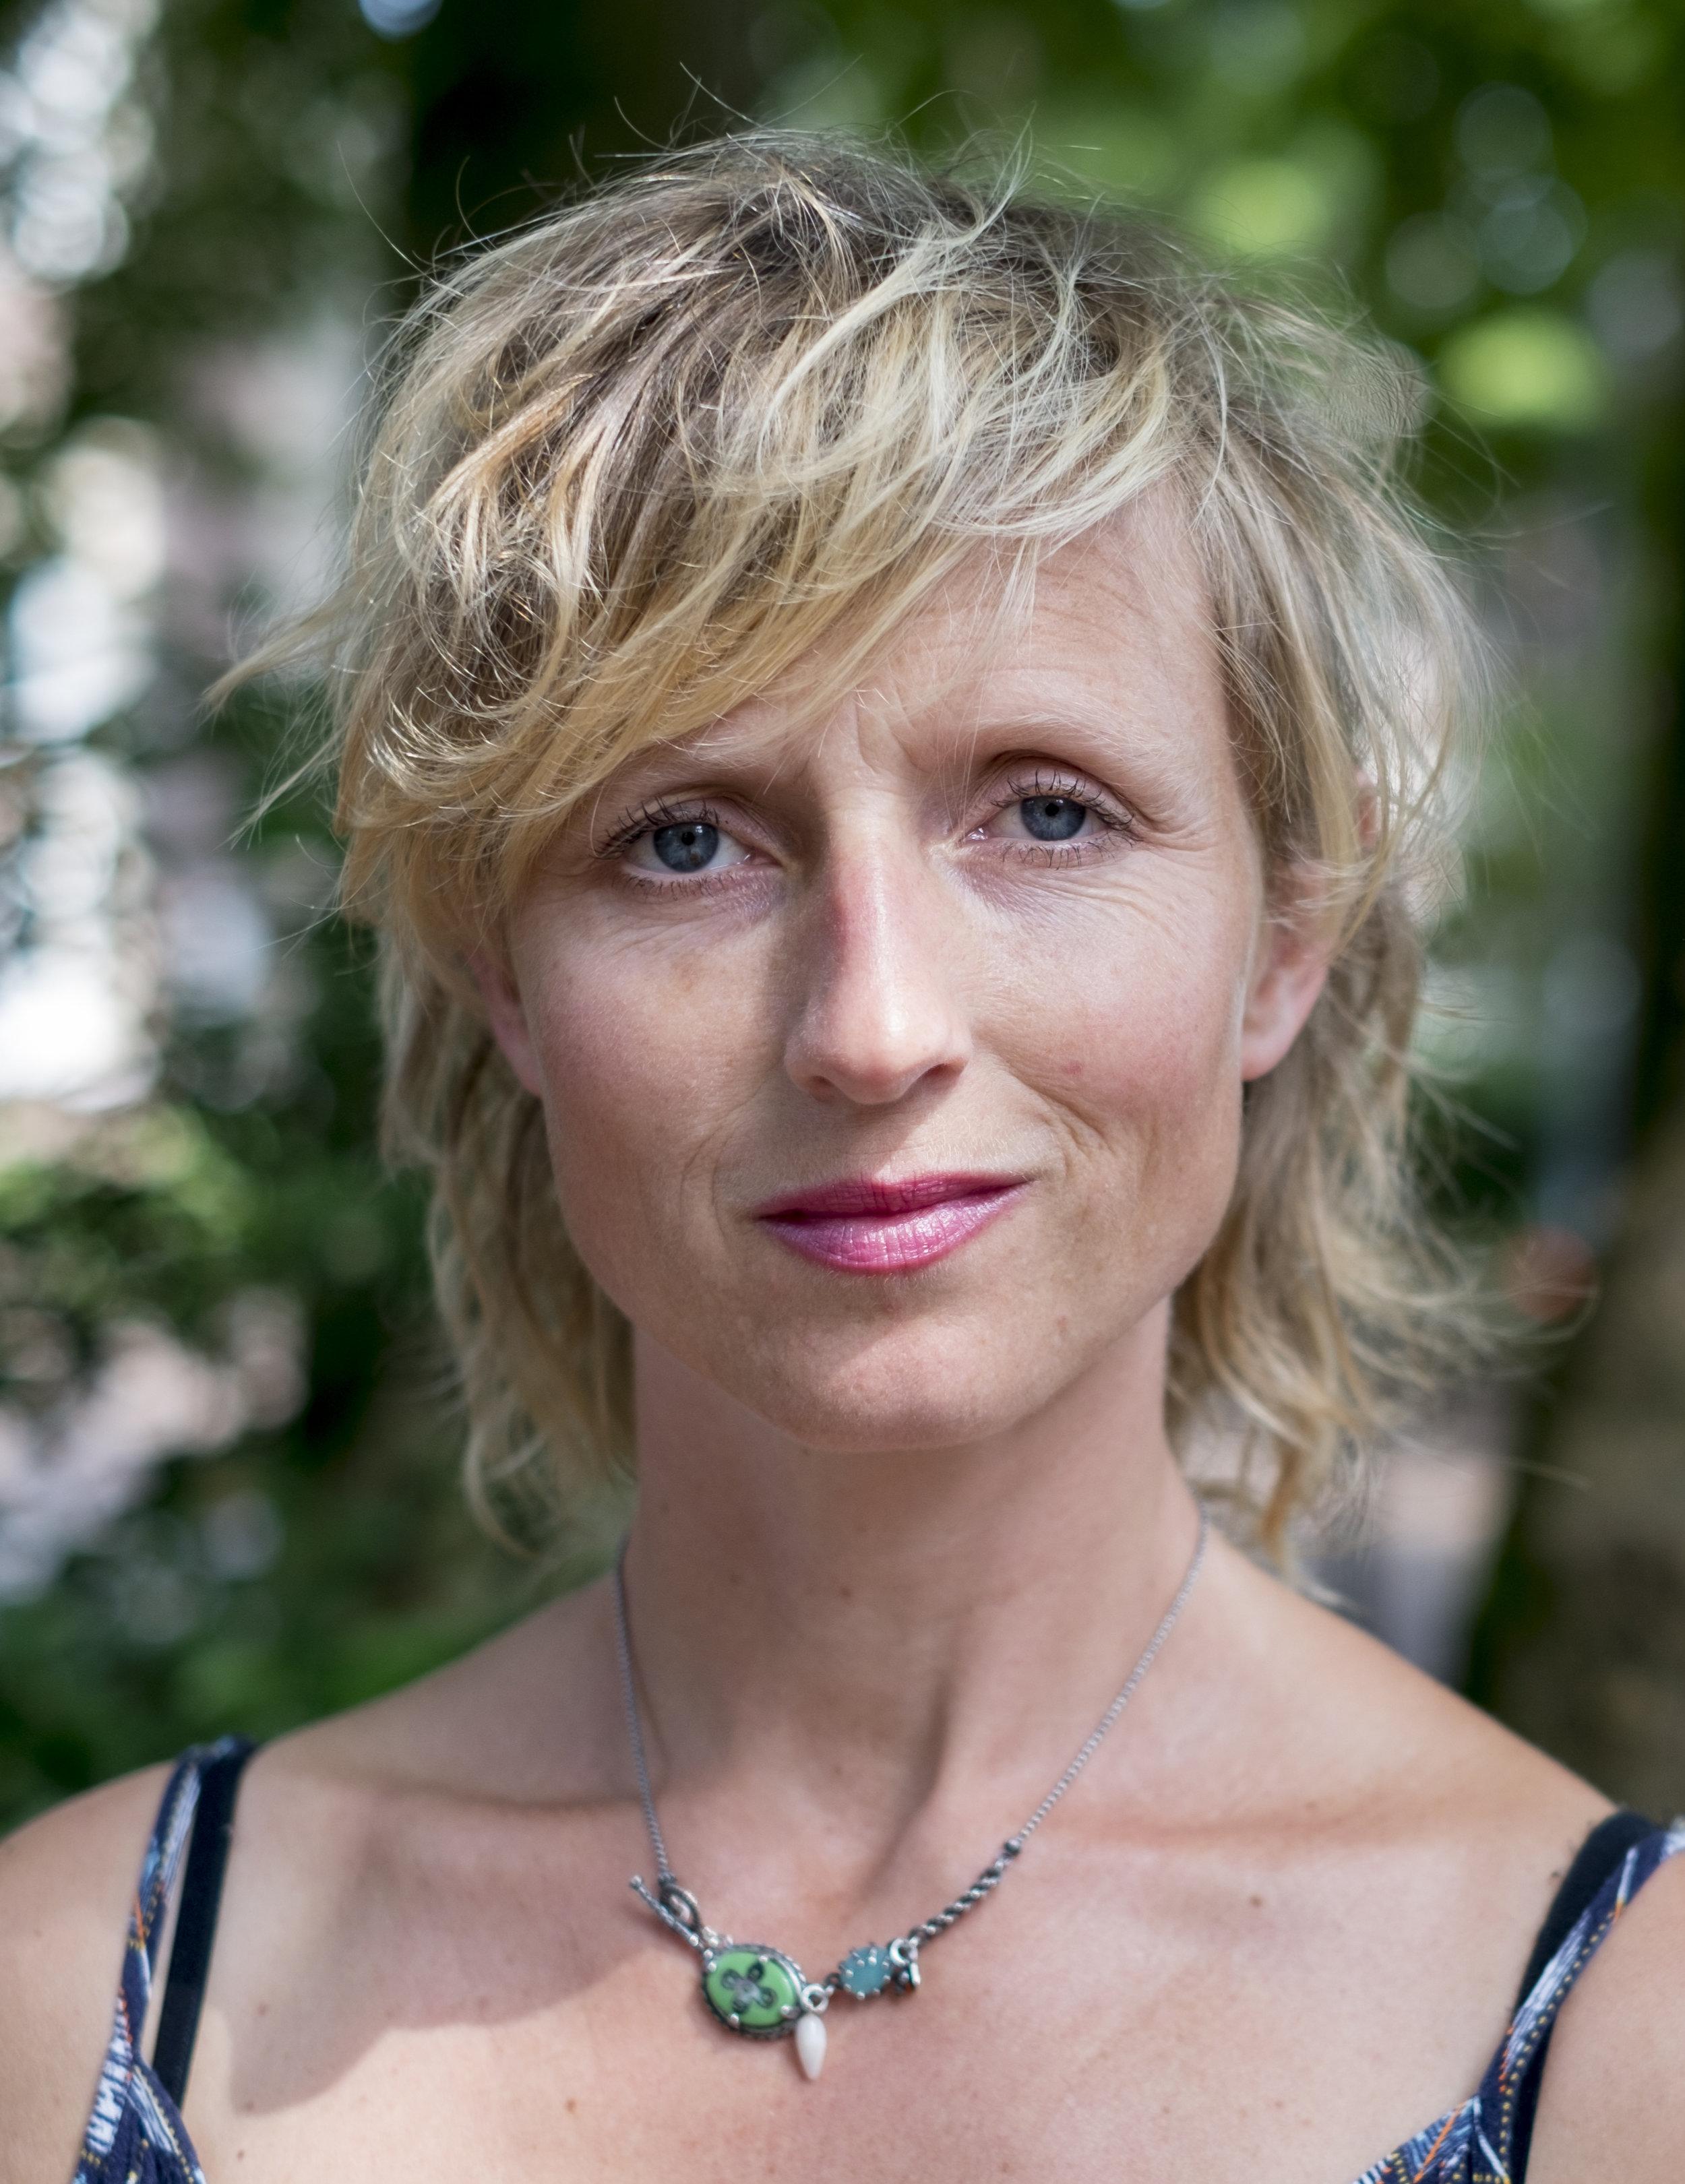 Marike op den Akker - Actor/Writer